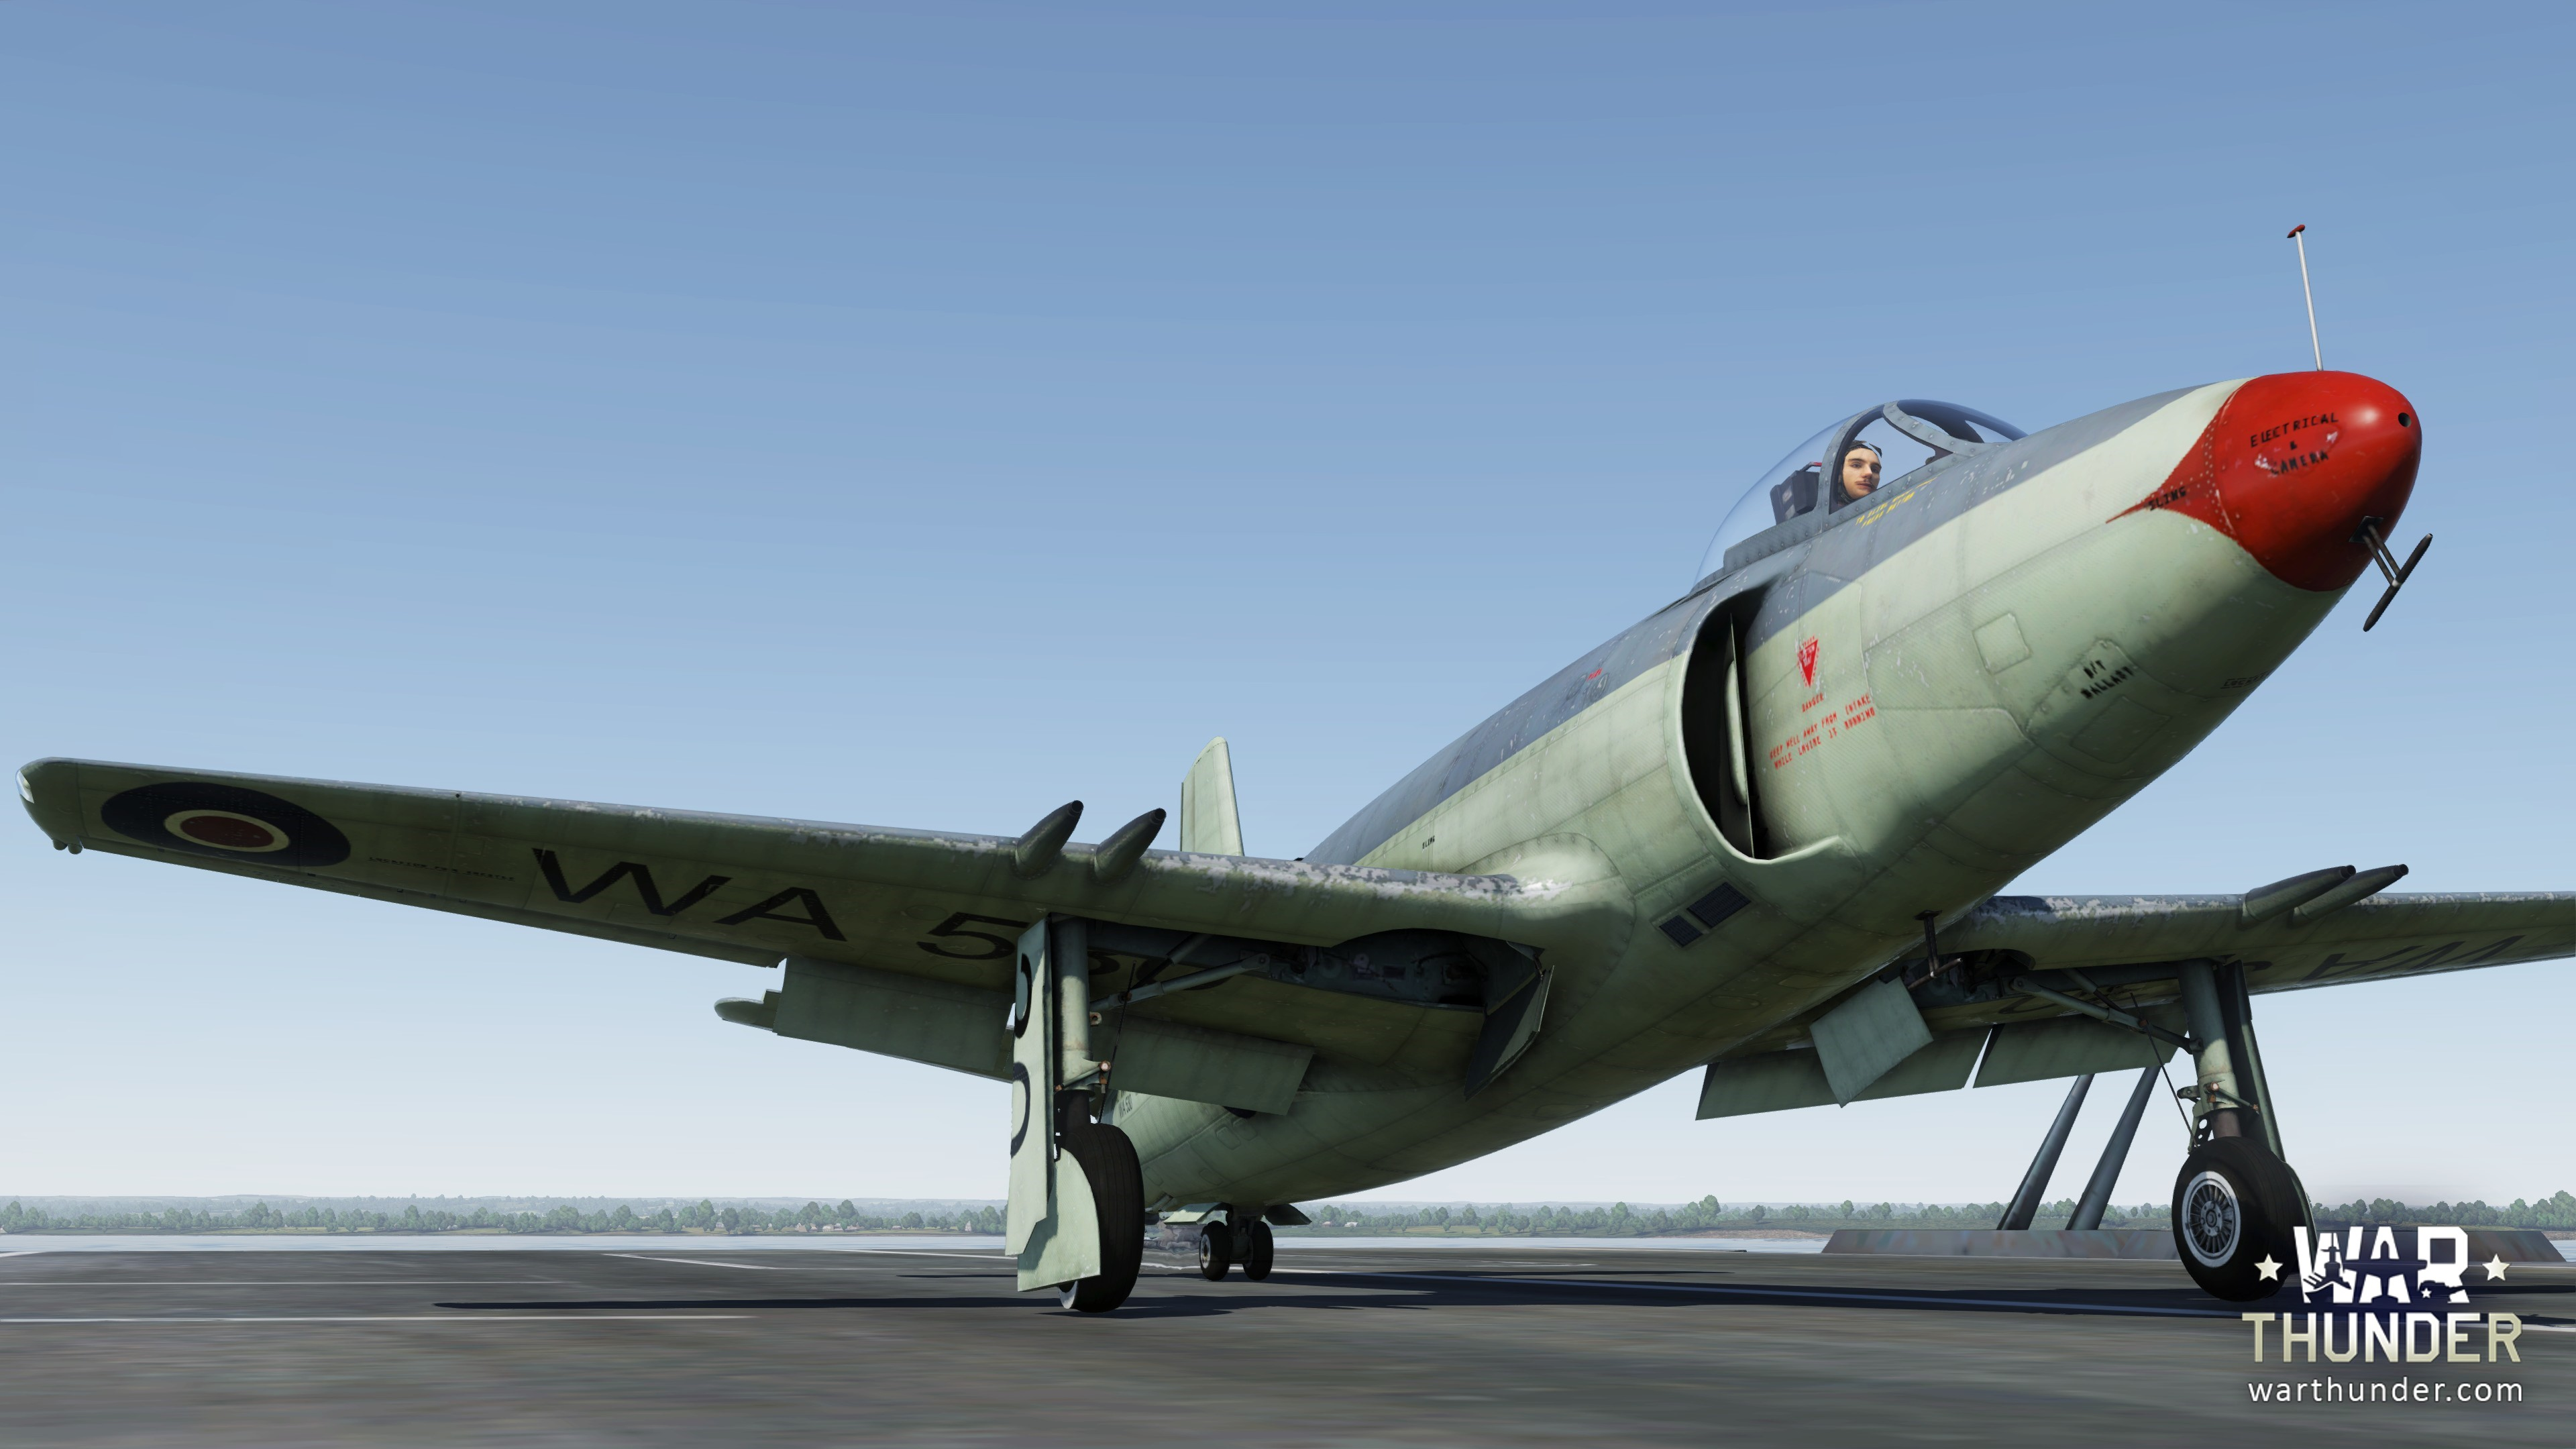 War thunder next gen mmo combat game for pc mac linux for Esstisch 1 20 m